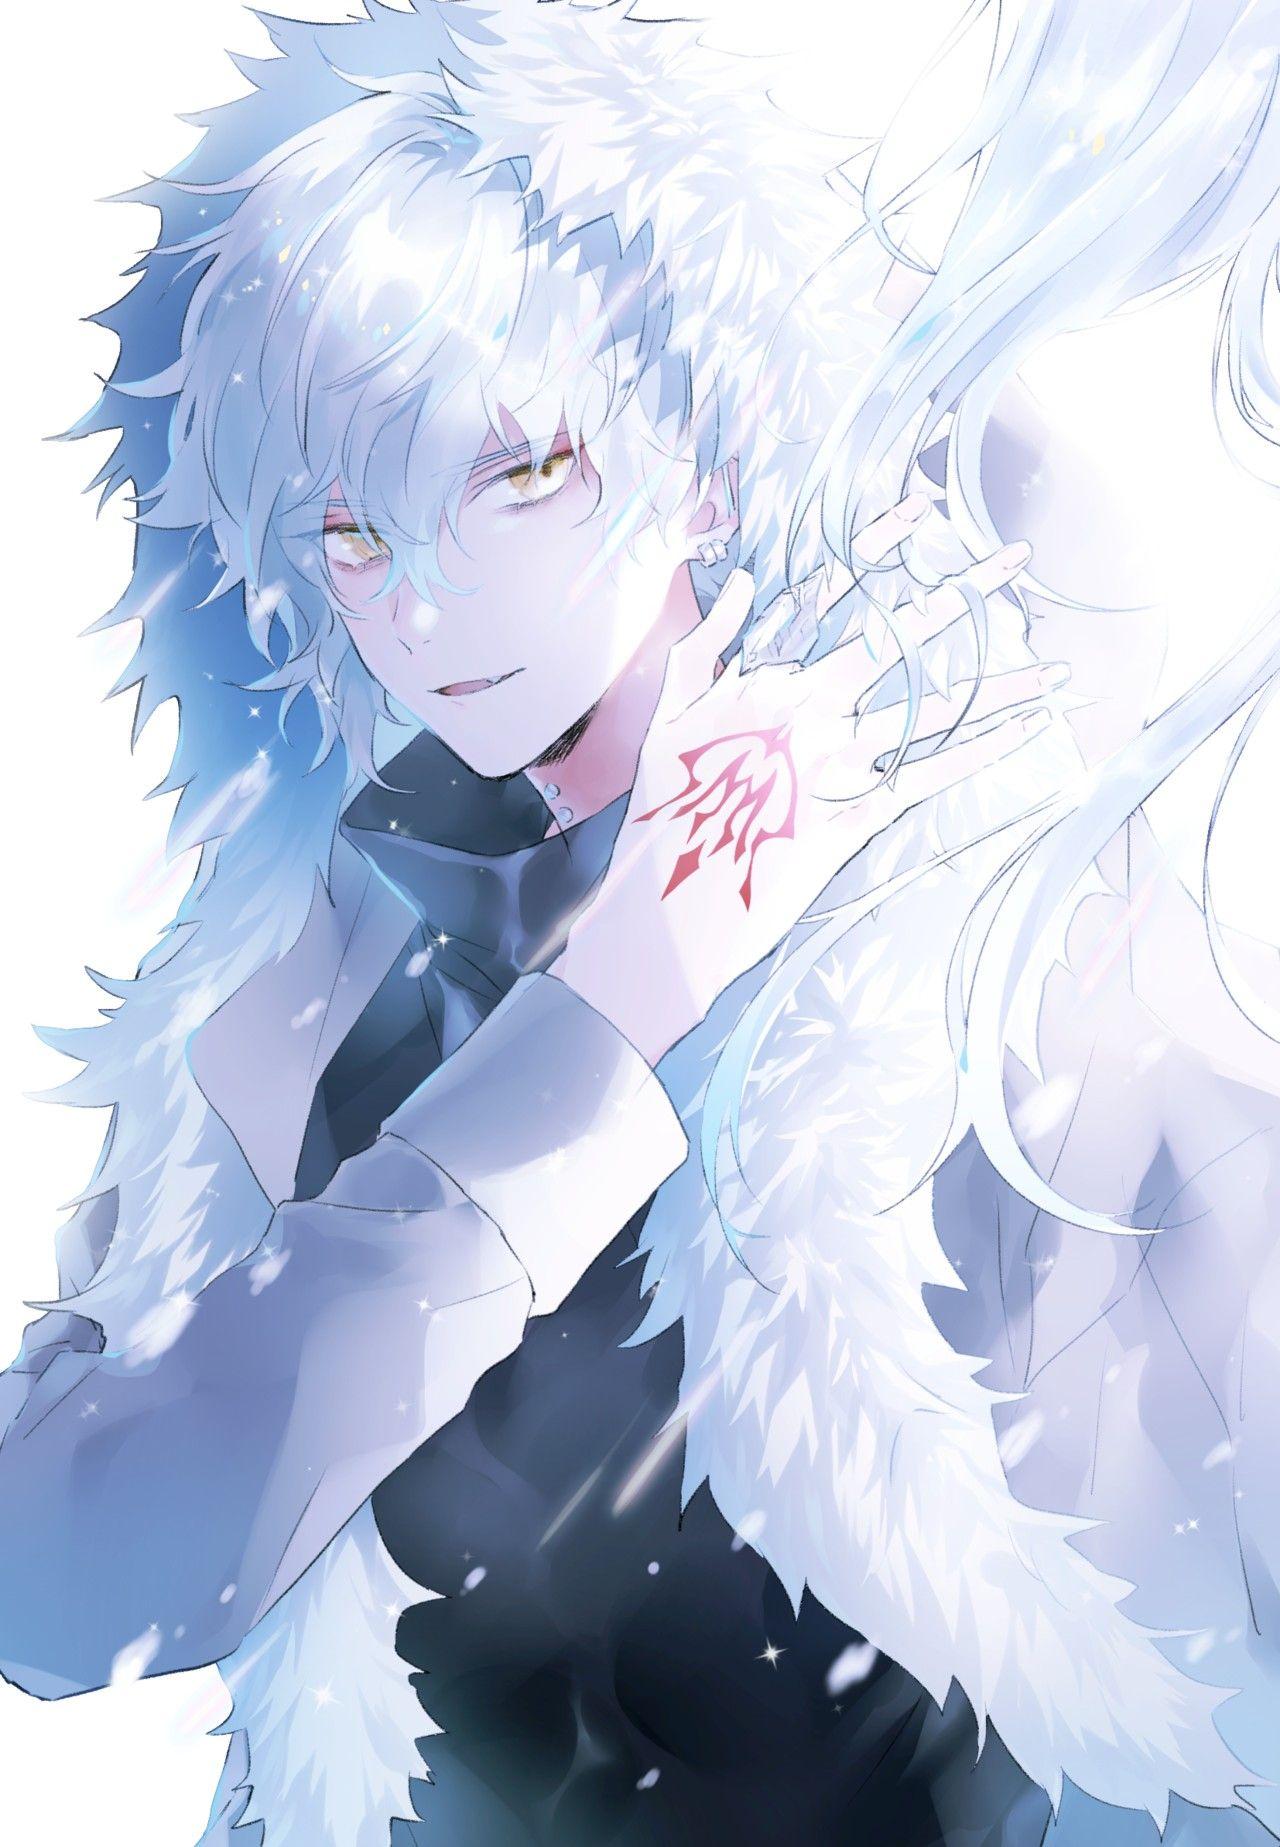 Kadoc Zemlupus Fate Grand Order Cool Anime Guys Dark Anime Anime Guys